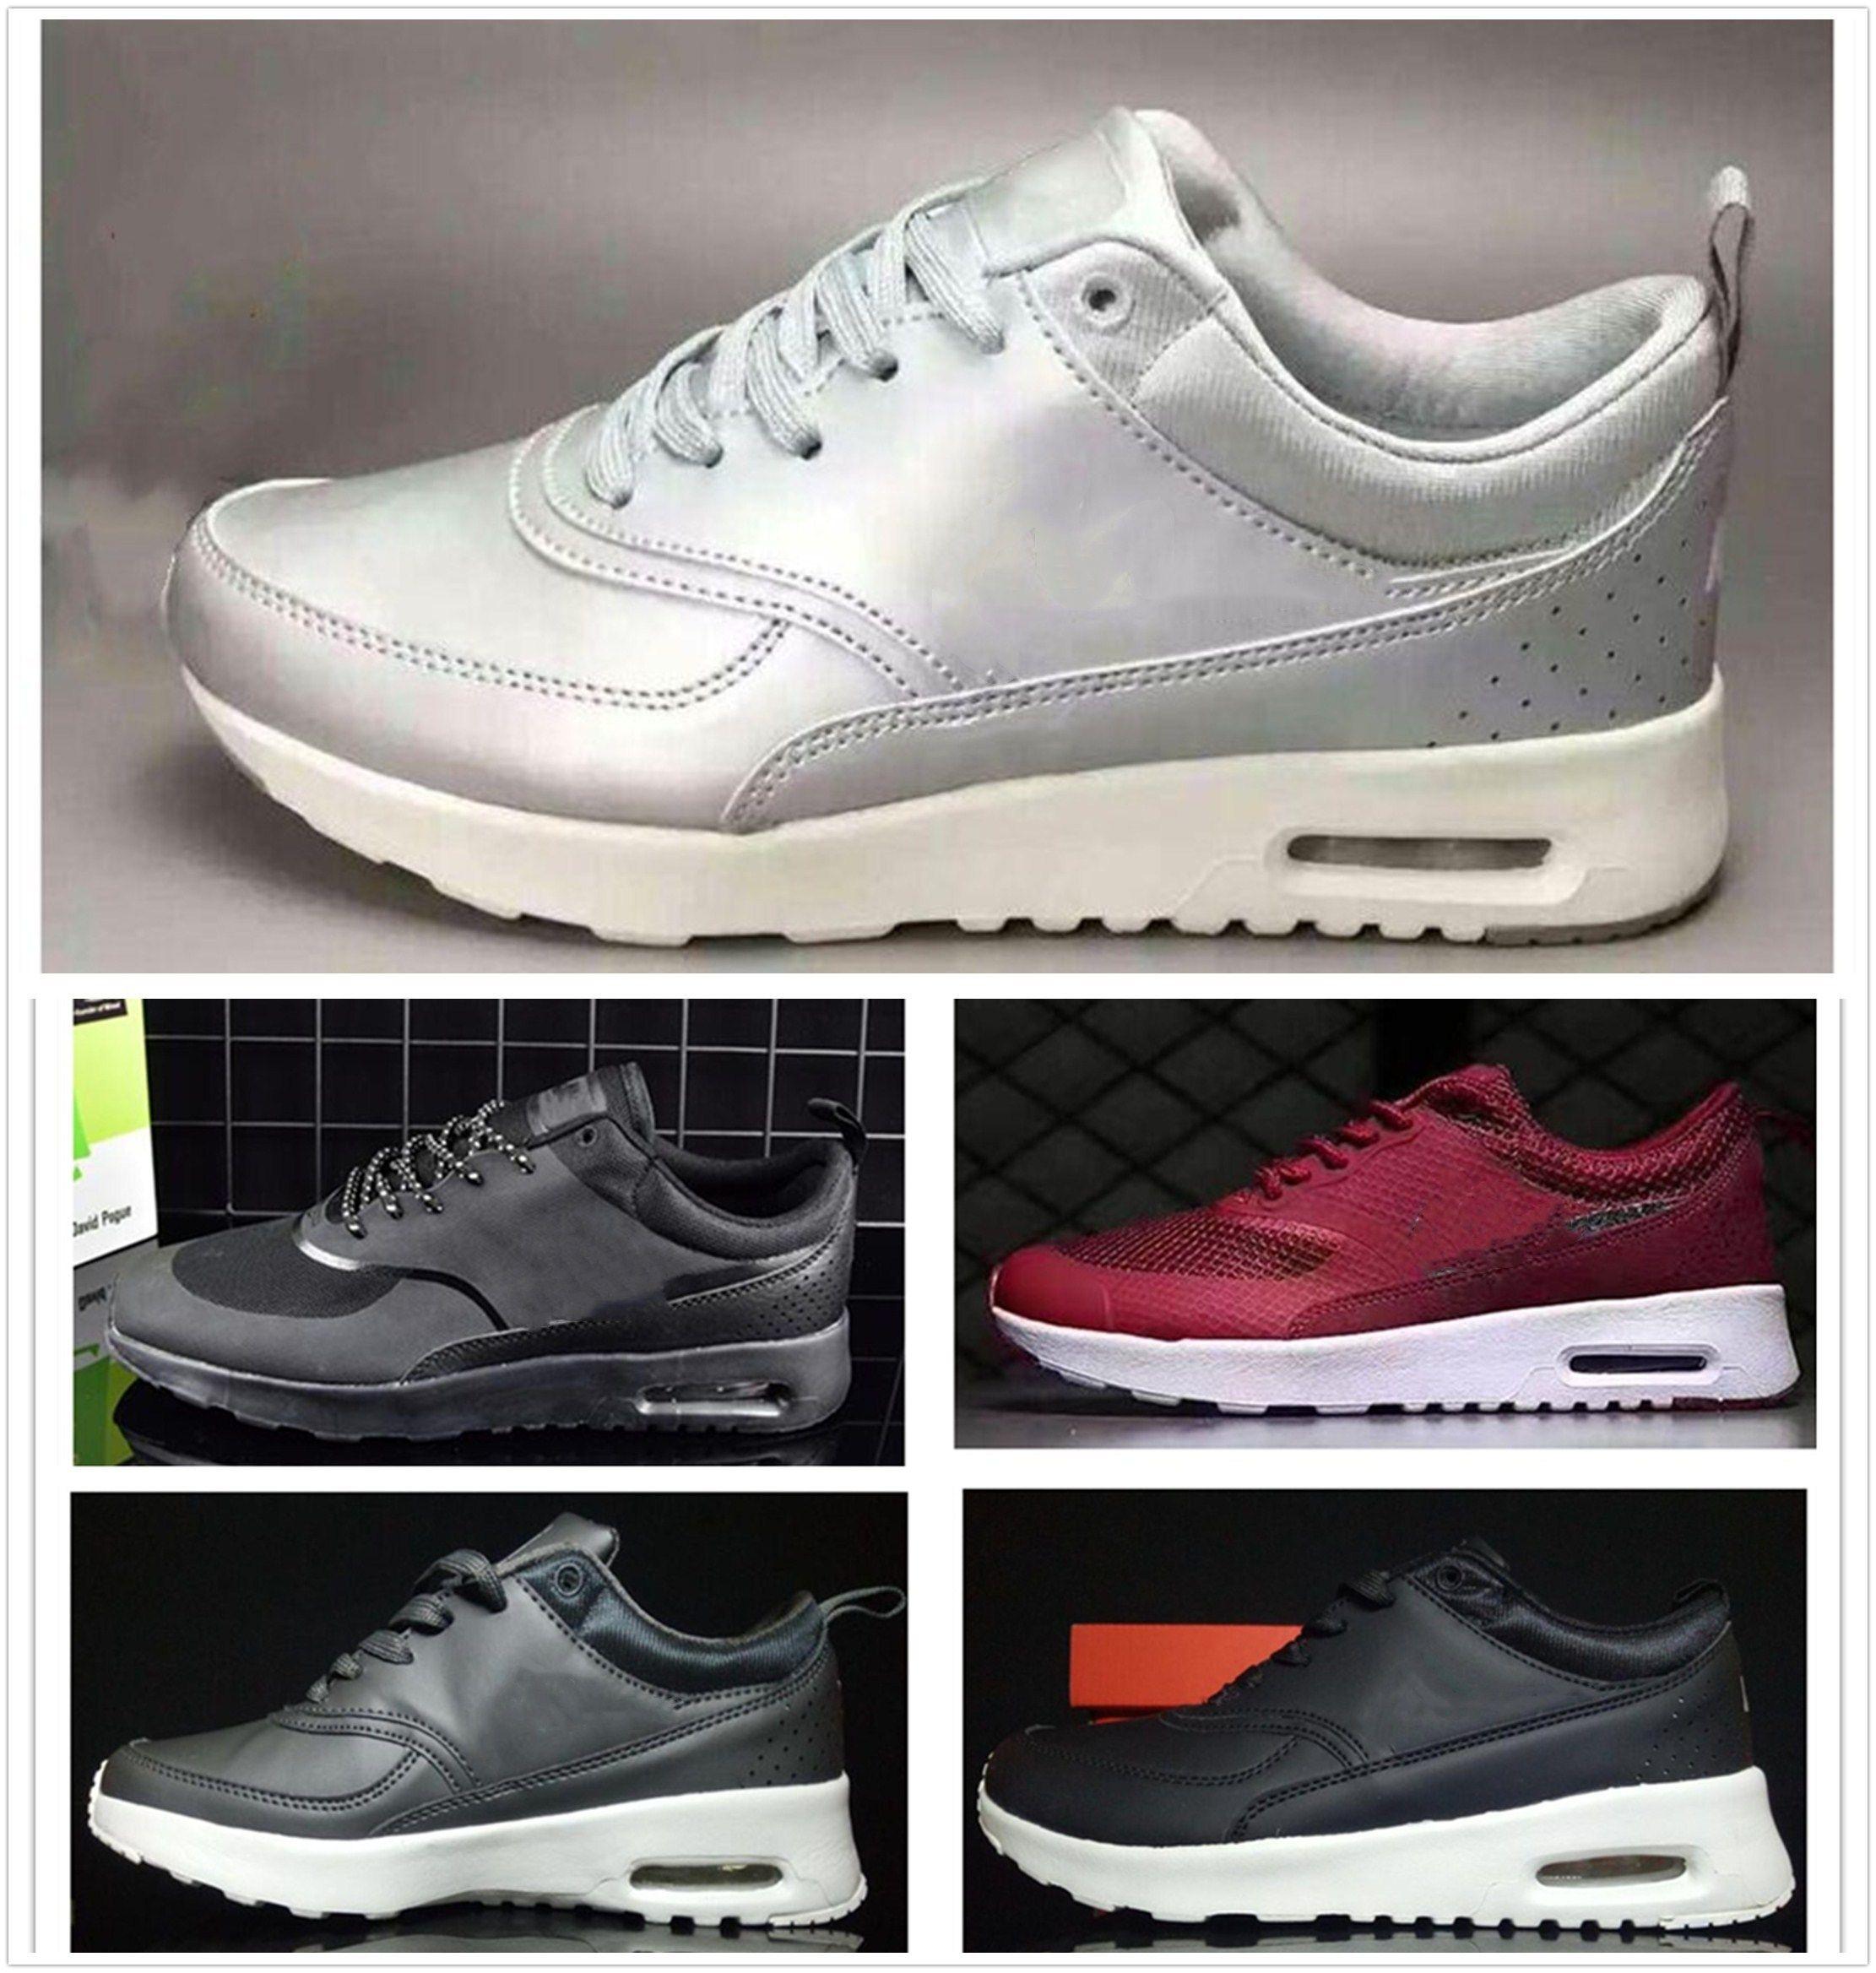 f5c51c9dfc8447 Großhandel Herren Nike Air Max Airmax 87 90 As Tavas Sneakers Schuhe Mann  Frauen Laufschuhe Casual Wanderschuhe Zapatillas 22 Farben Größe Eur 36 45  Von ...